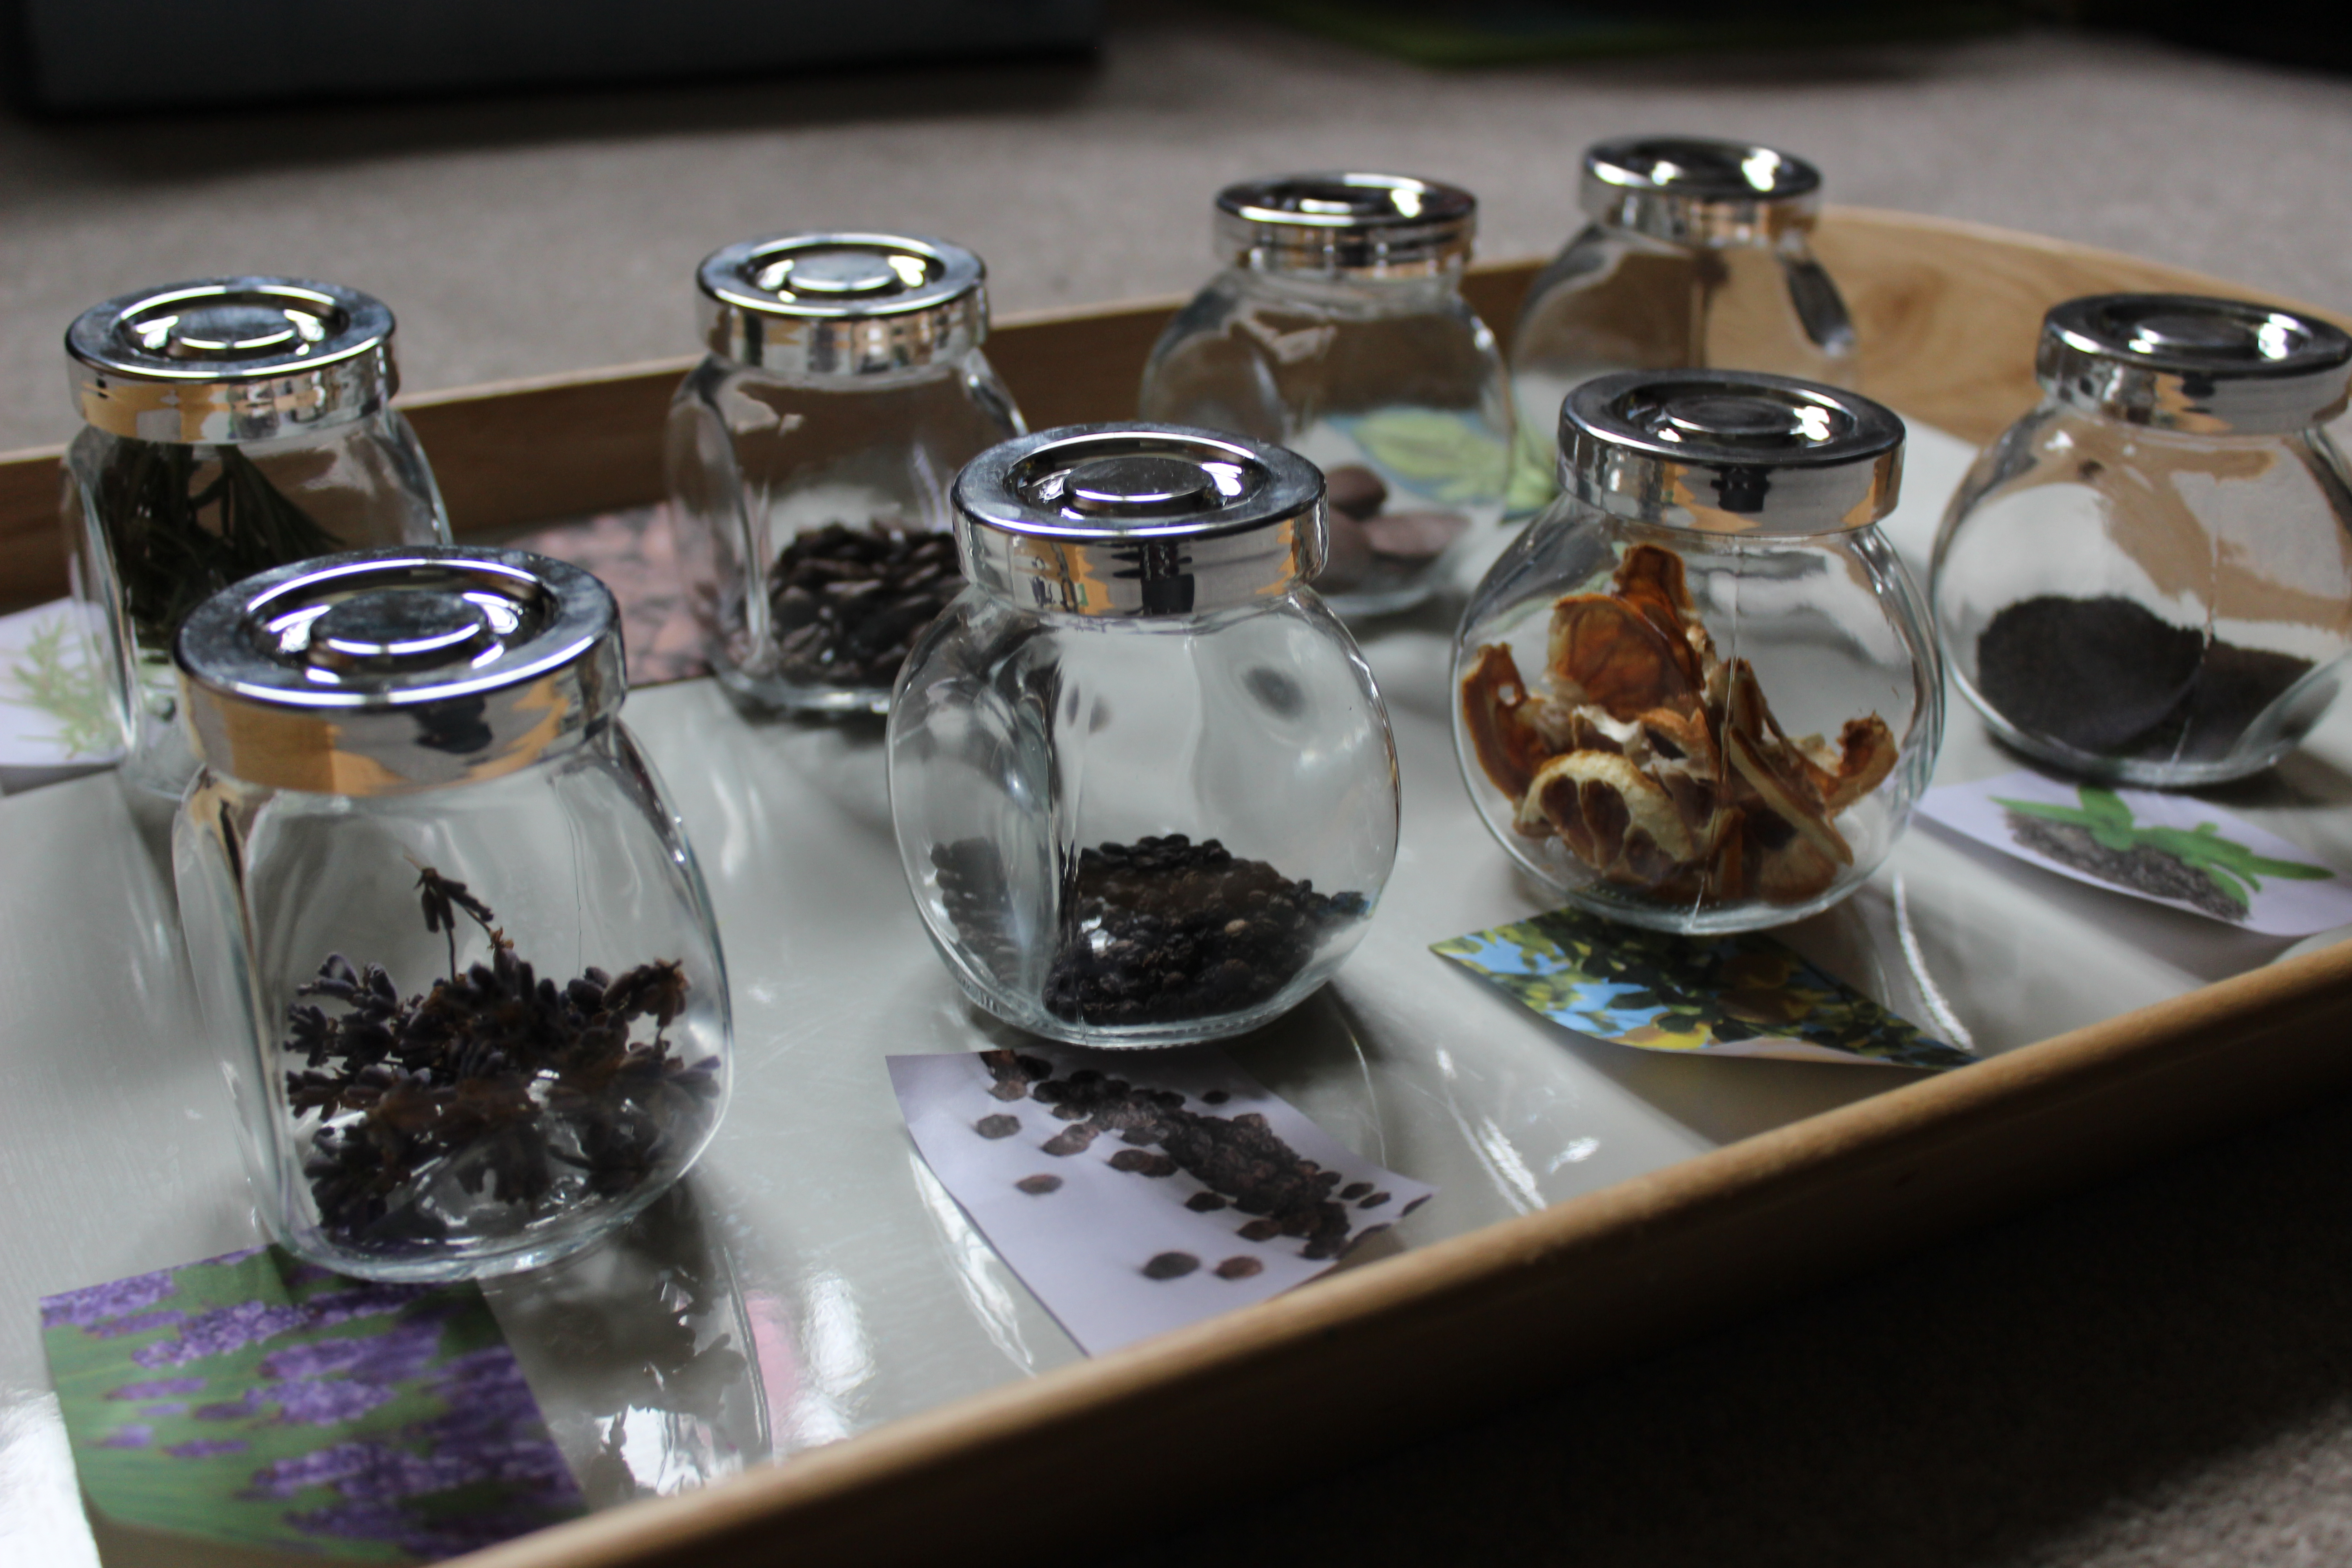 Diy Sensory Smelling Game